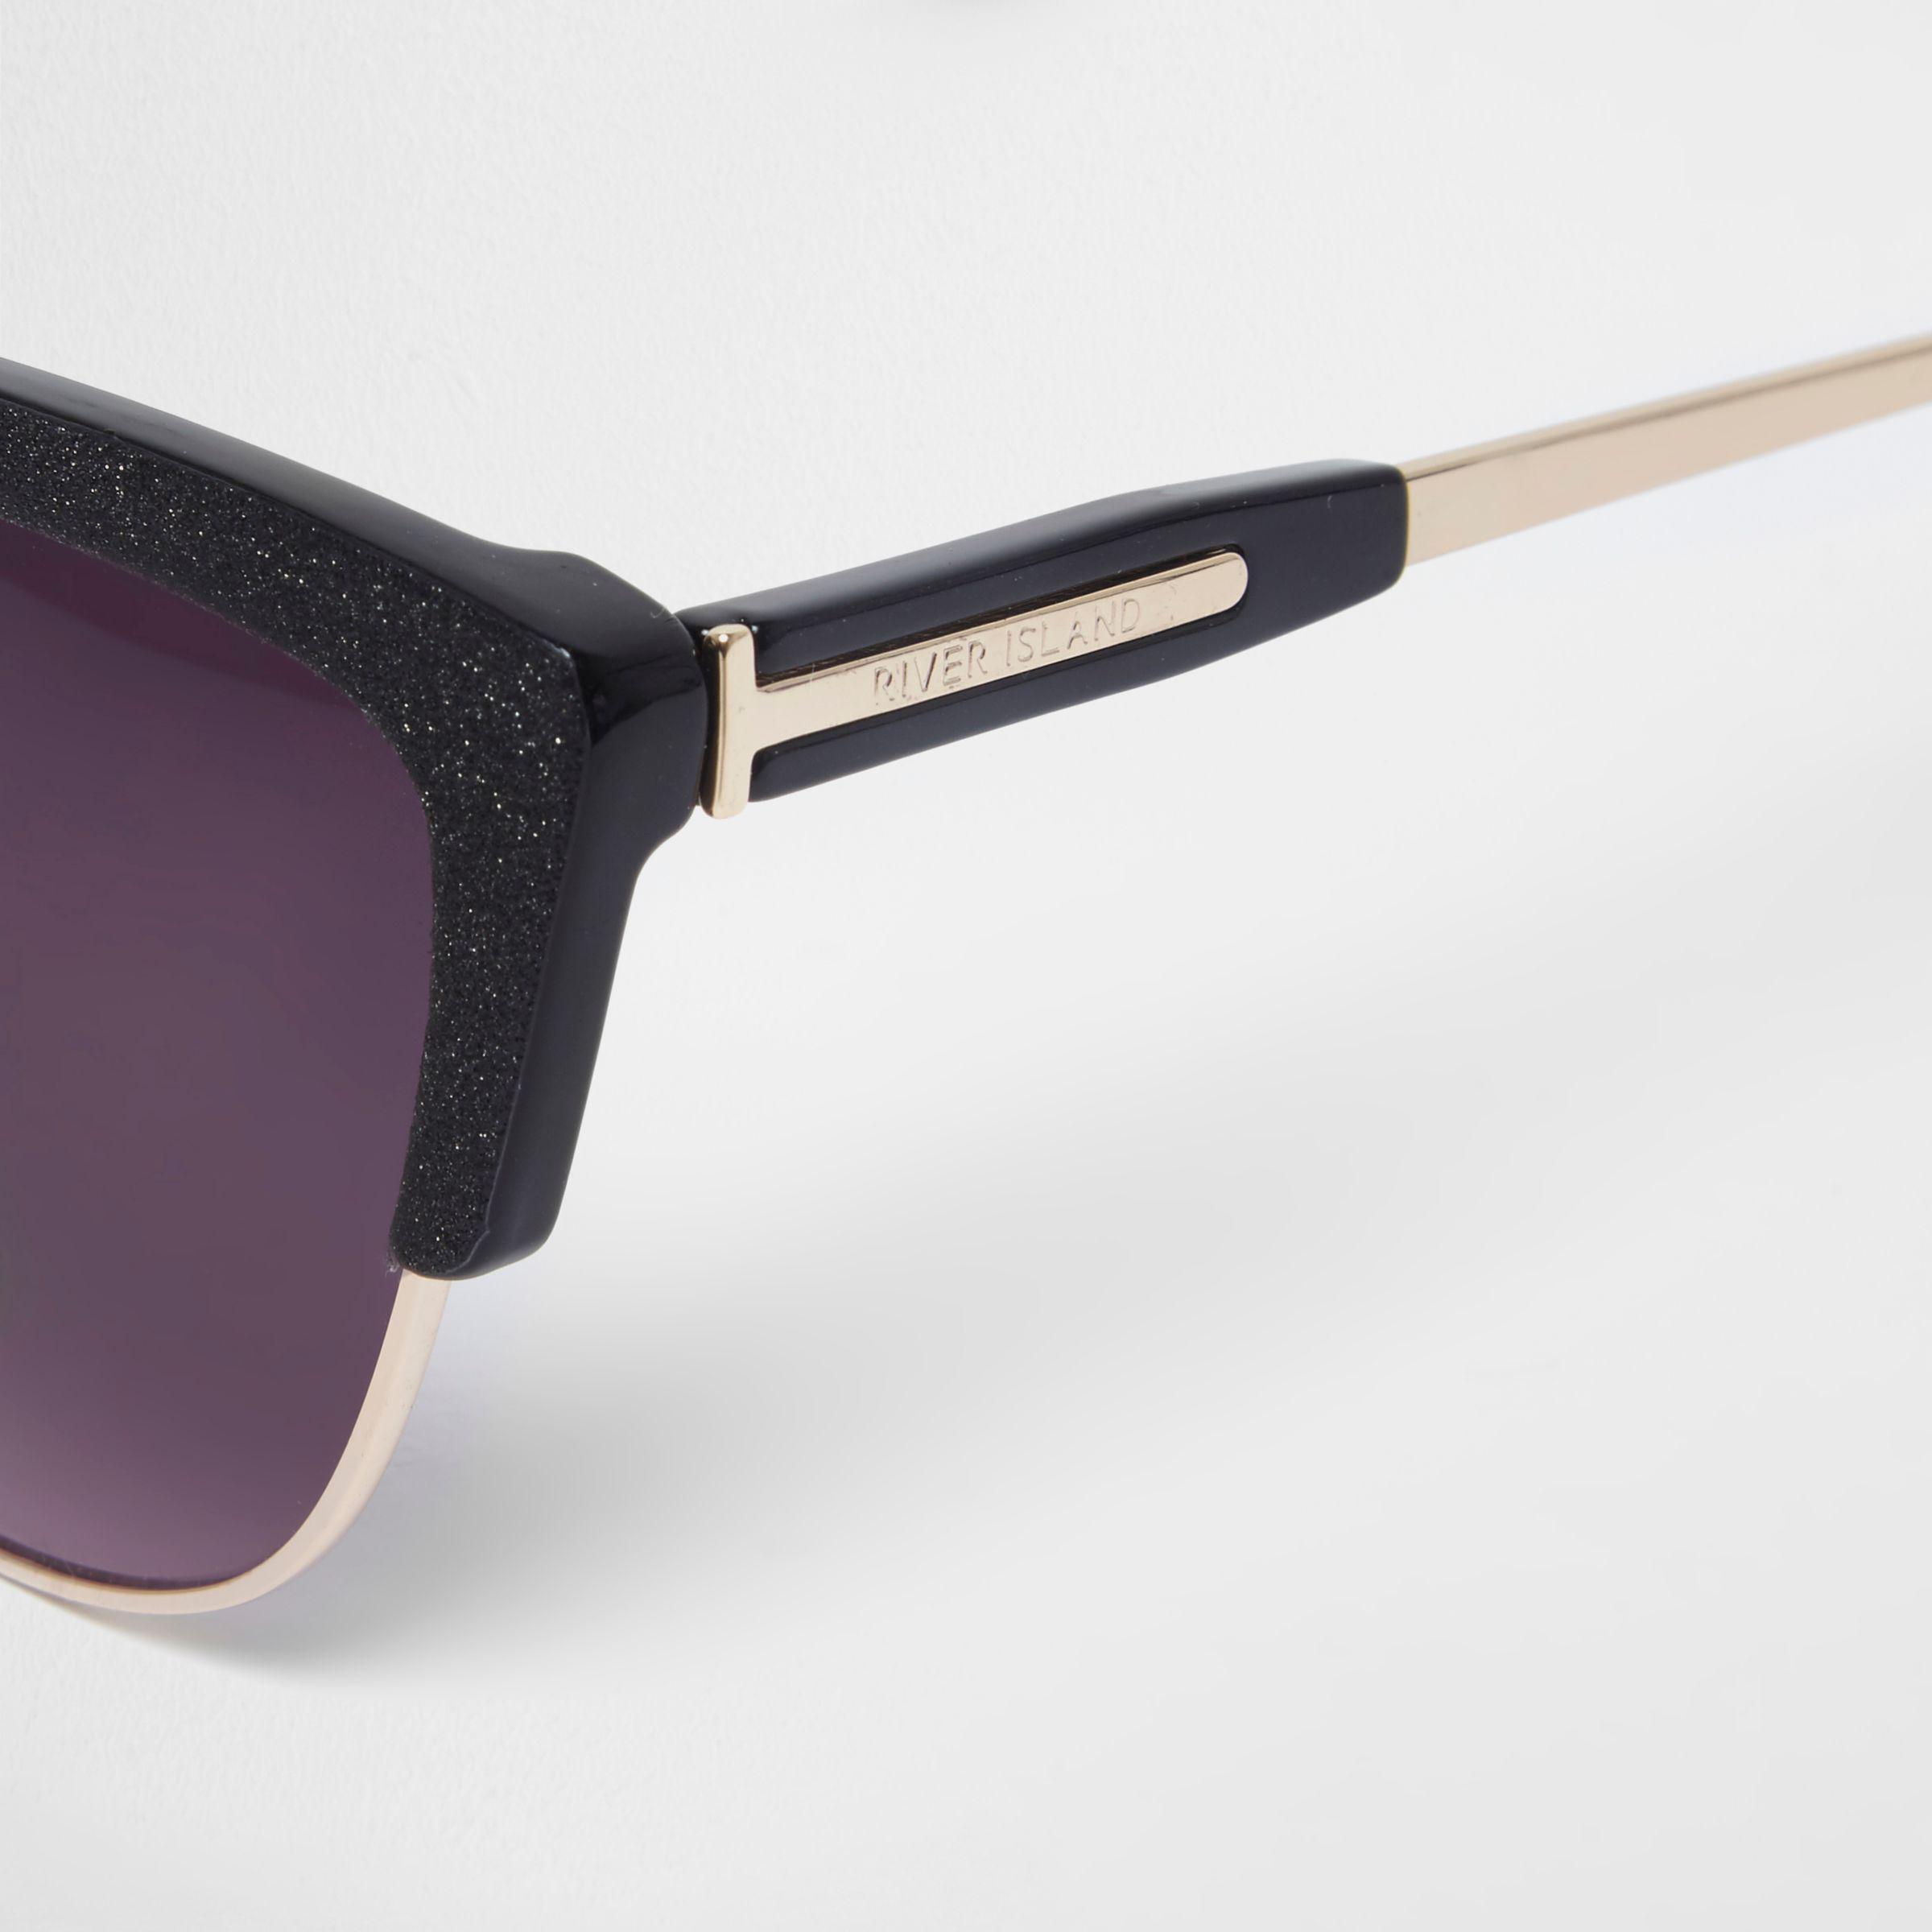 d4f0c8d5a01 Lyst - River Island Black Glitter Cat Eye Oxblood Lens Sunglasses in ...